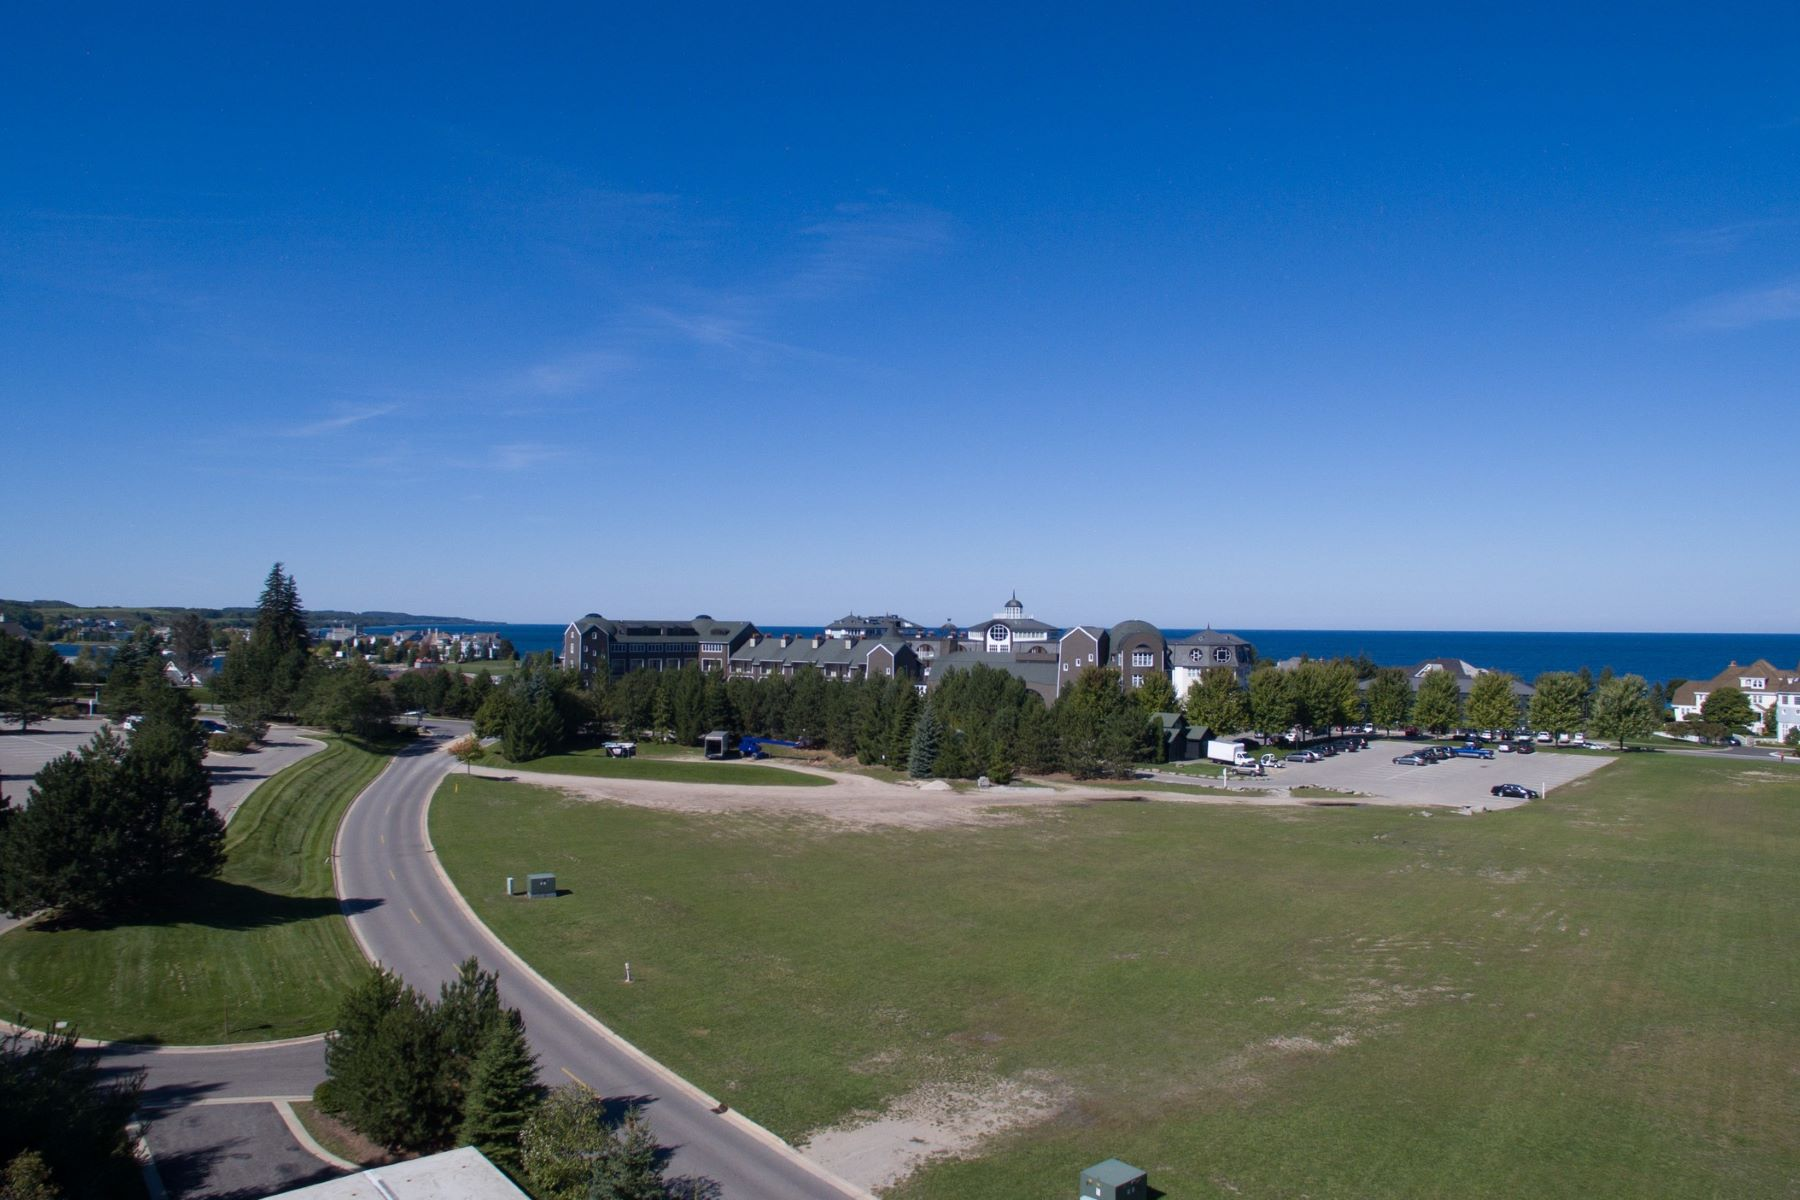 Additional photo for property listing at Unit 2, The Ridge 3800 Cliffs Drive, Unit 2, The Ridge Bay Harbor, Michigan 49770 United States